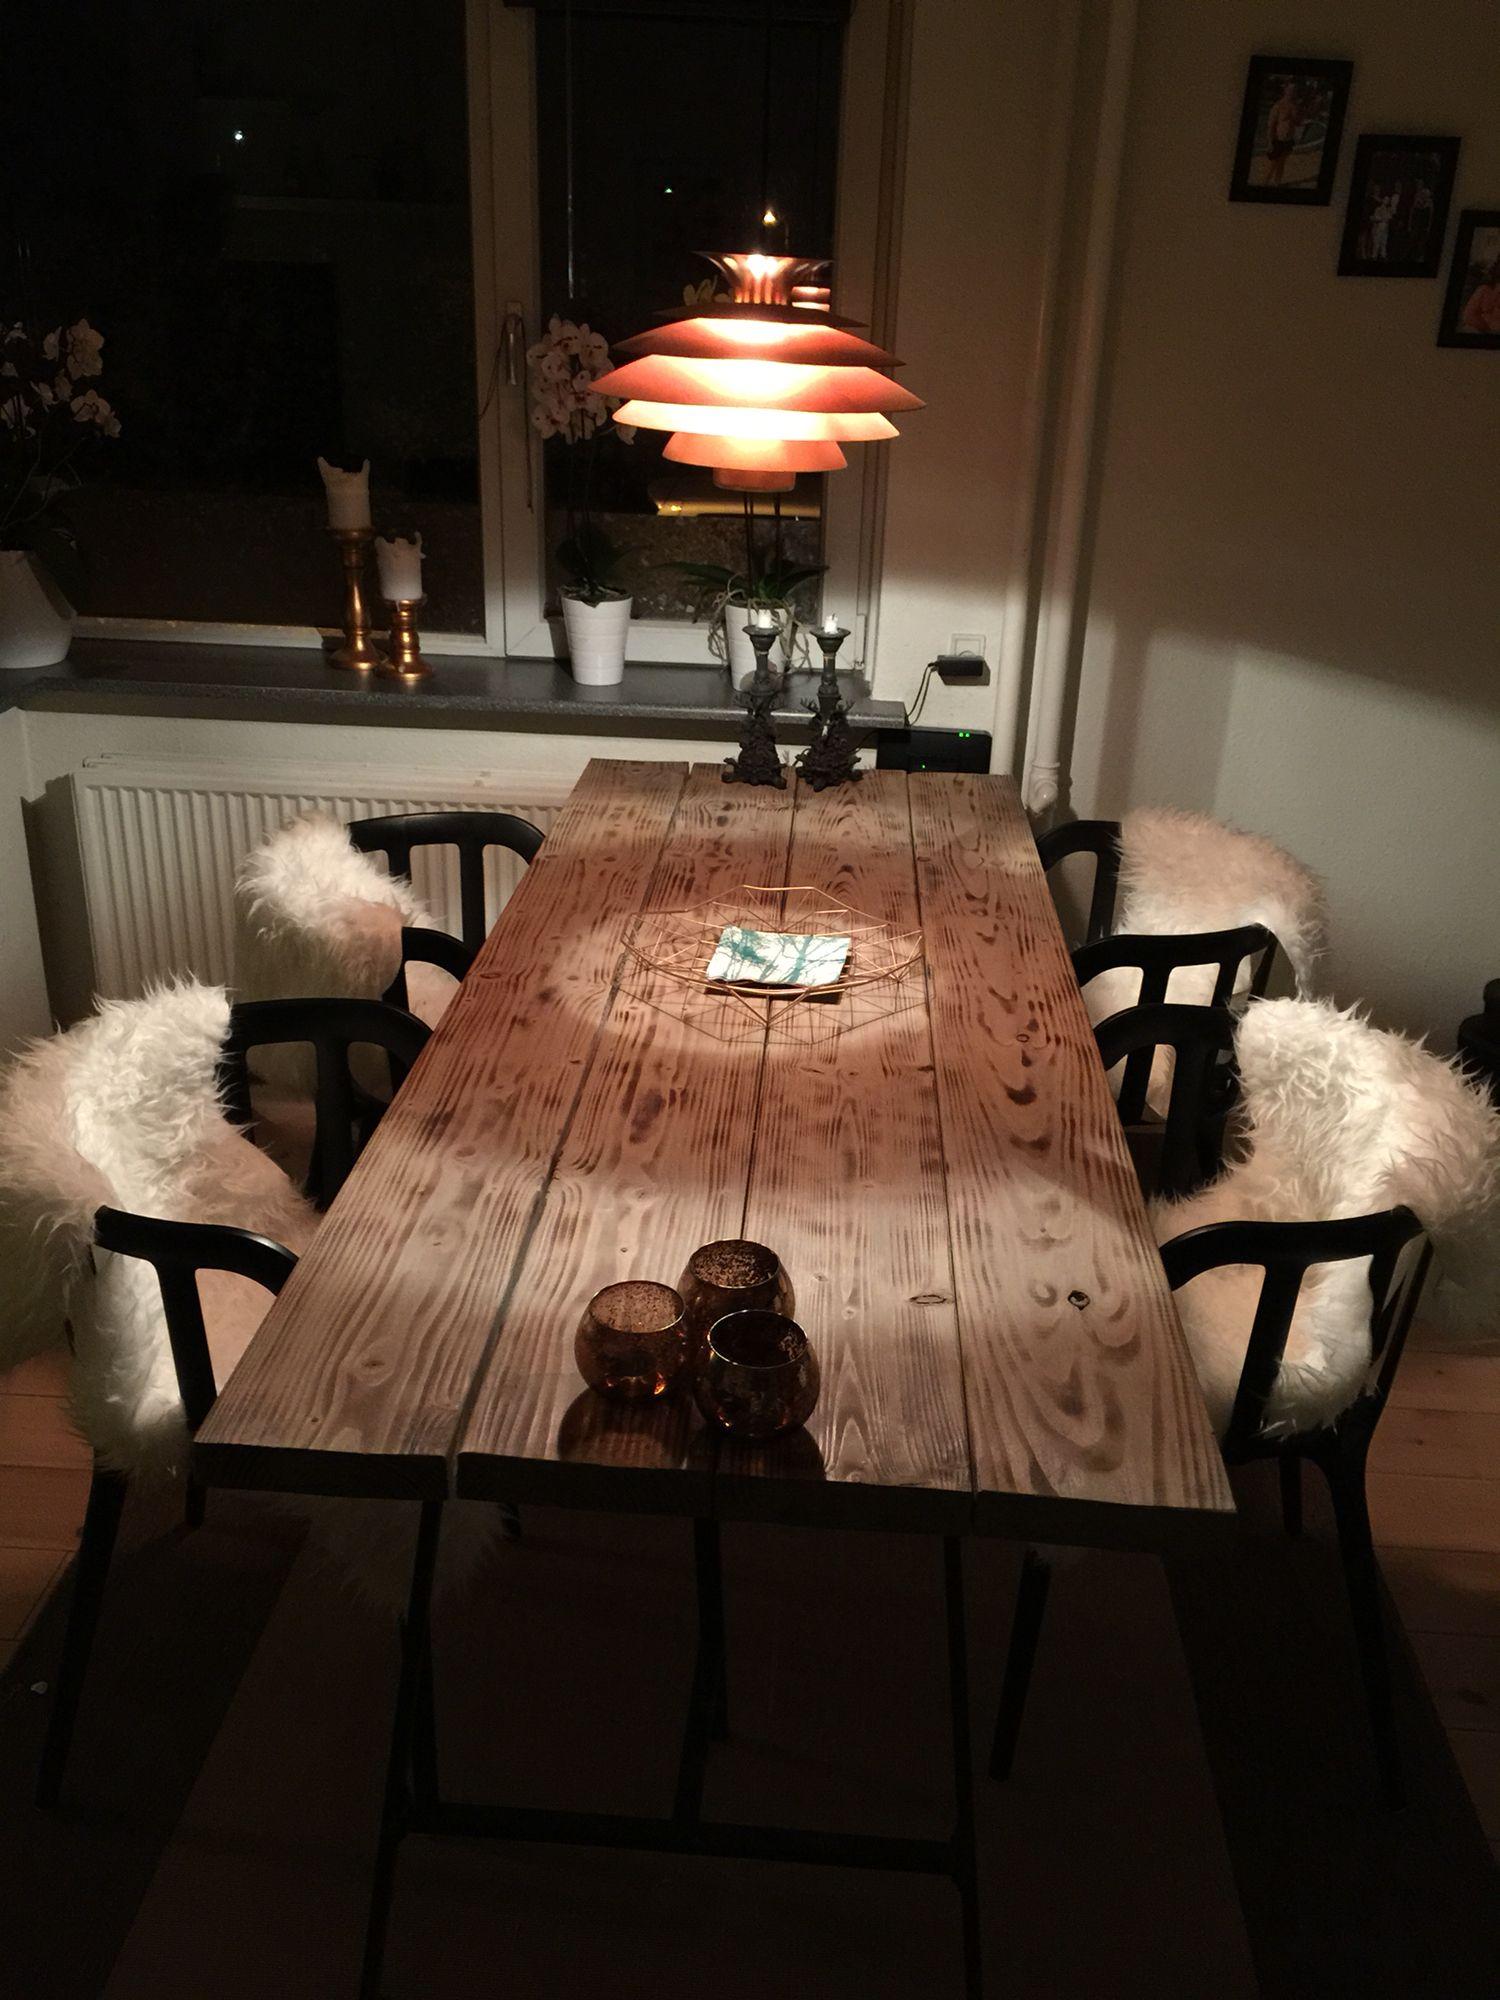 Elsker mit spisebord lavet for 487kr med tr230 fra jem og  : 8a36341b97c3feb4faedb89b2d2bc891 from no.pinterest.com size 1500 x 2000 jpeg 2649kB